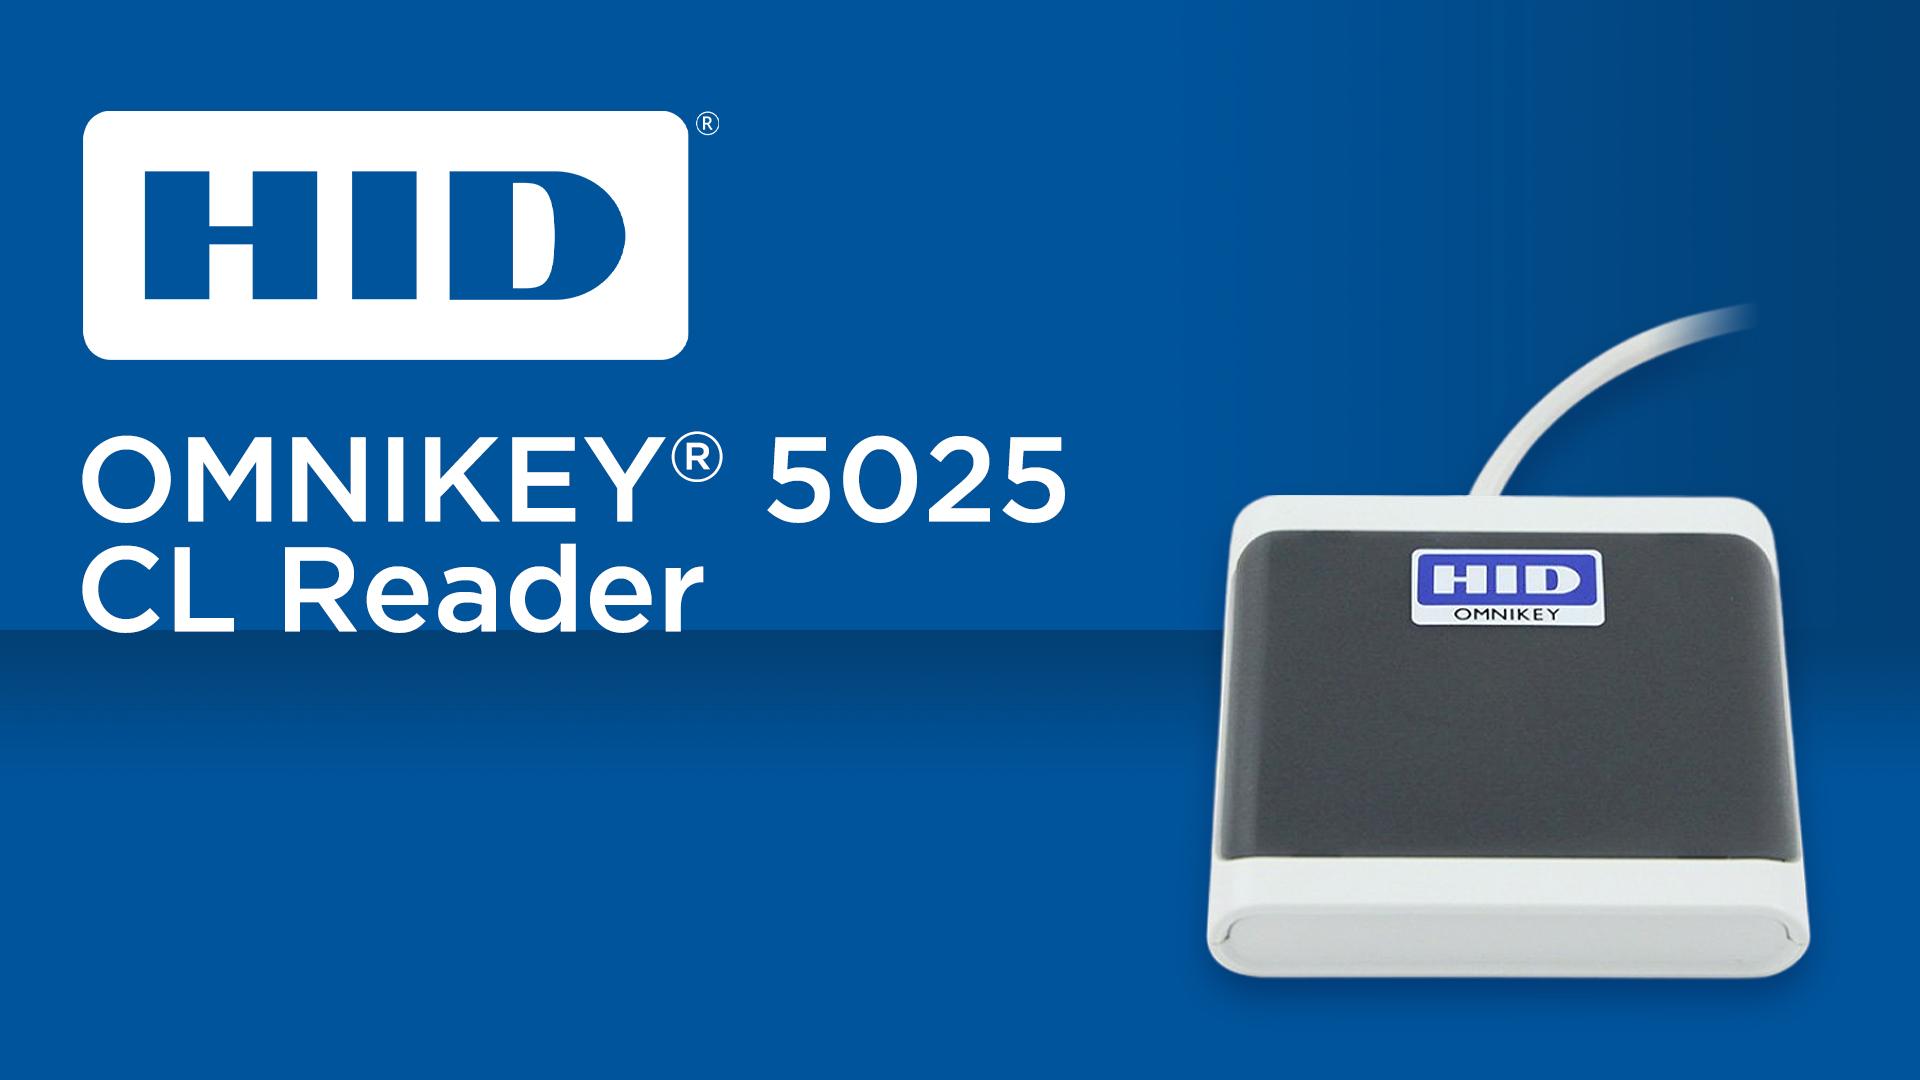 HID Omnikey 5025 CL Reader